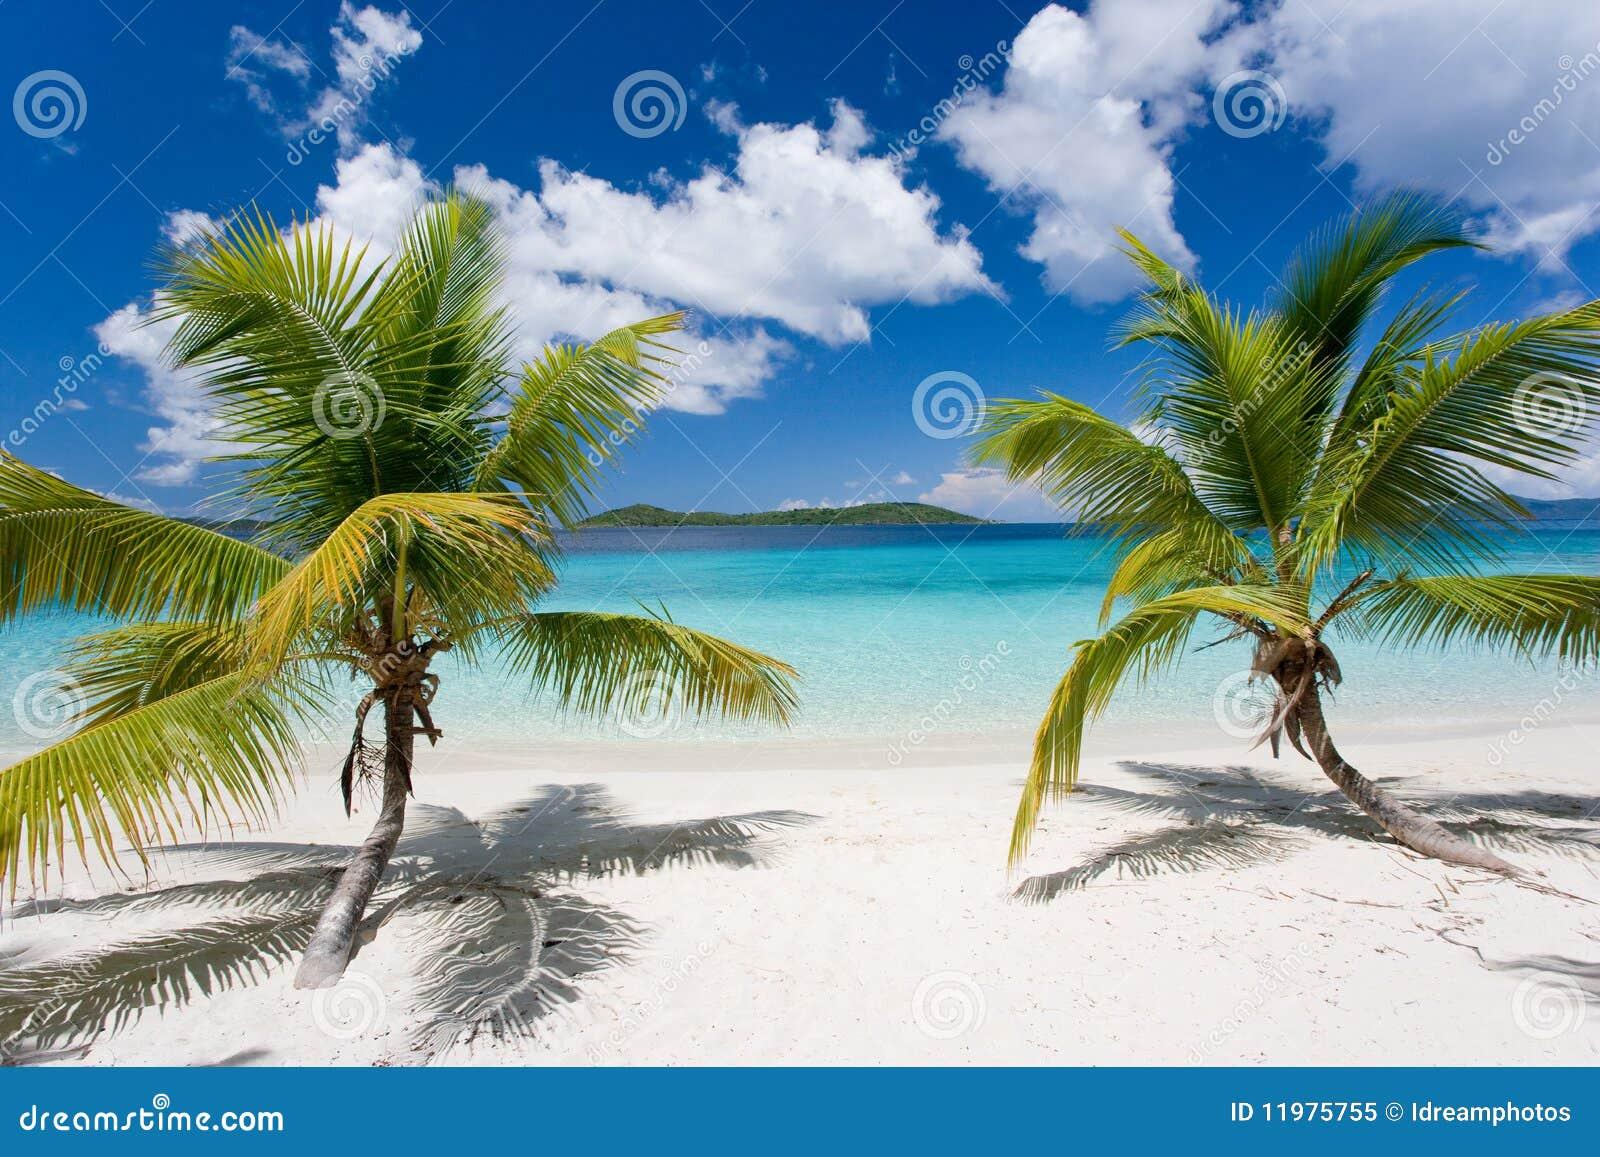 palm tree tropical island beach royalty free stock photo image 11975755. Black Bedroom Furniture Sets. Home Design Ideas